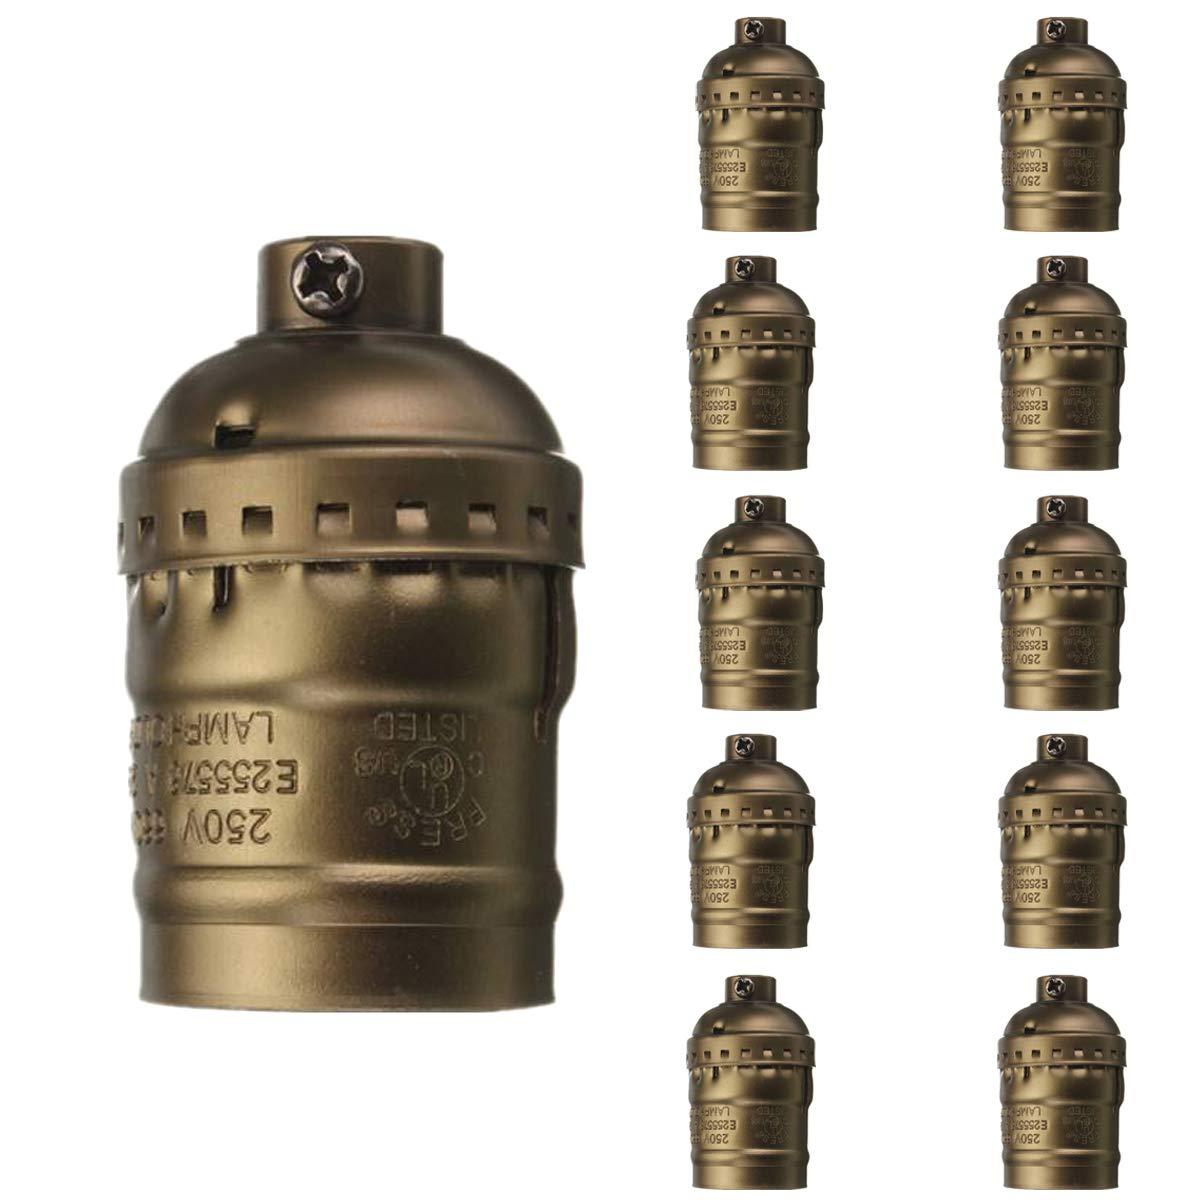 10pcs Vintage Aluminium Lamp Holder, Motent Industrial Retro Solid Metal Shell Socket Without Switch, US Standard E26 Edison Medium Screw Bulb Base, 33mm Dia for Pendant Light Wall Lamp - Bronze